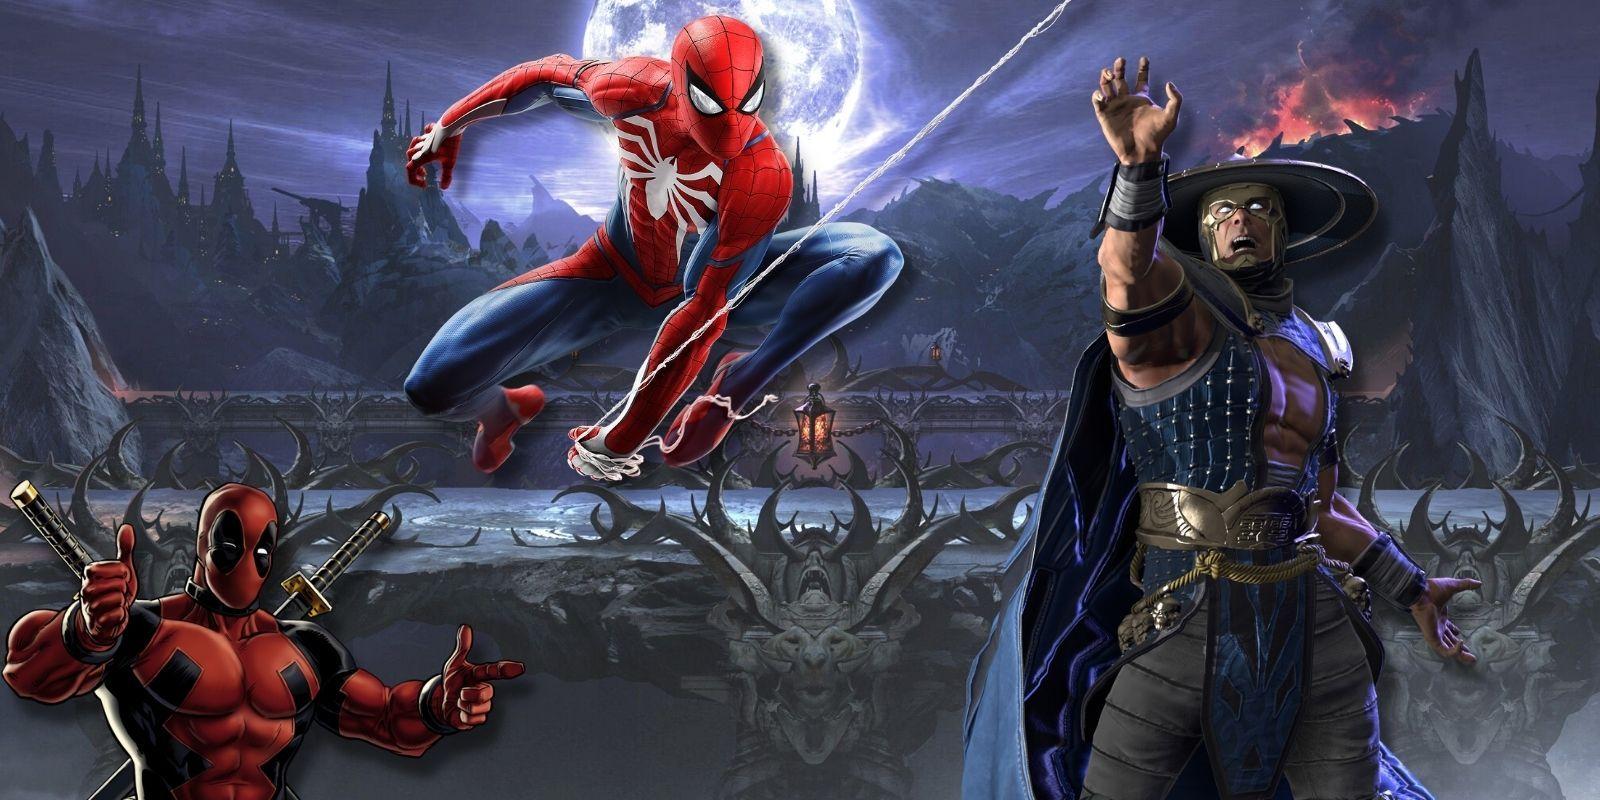 RUMOR: Roster for NetherRealm's Marvel Fighting Game Leaks | CBR - CBR - Comic Book Resources